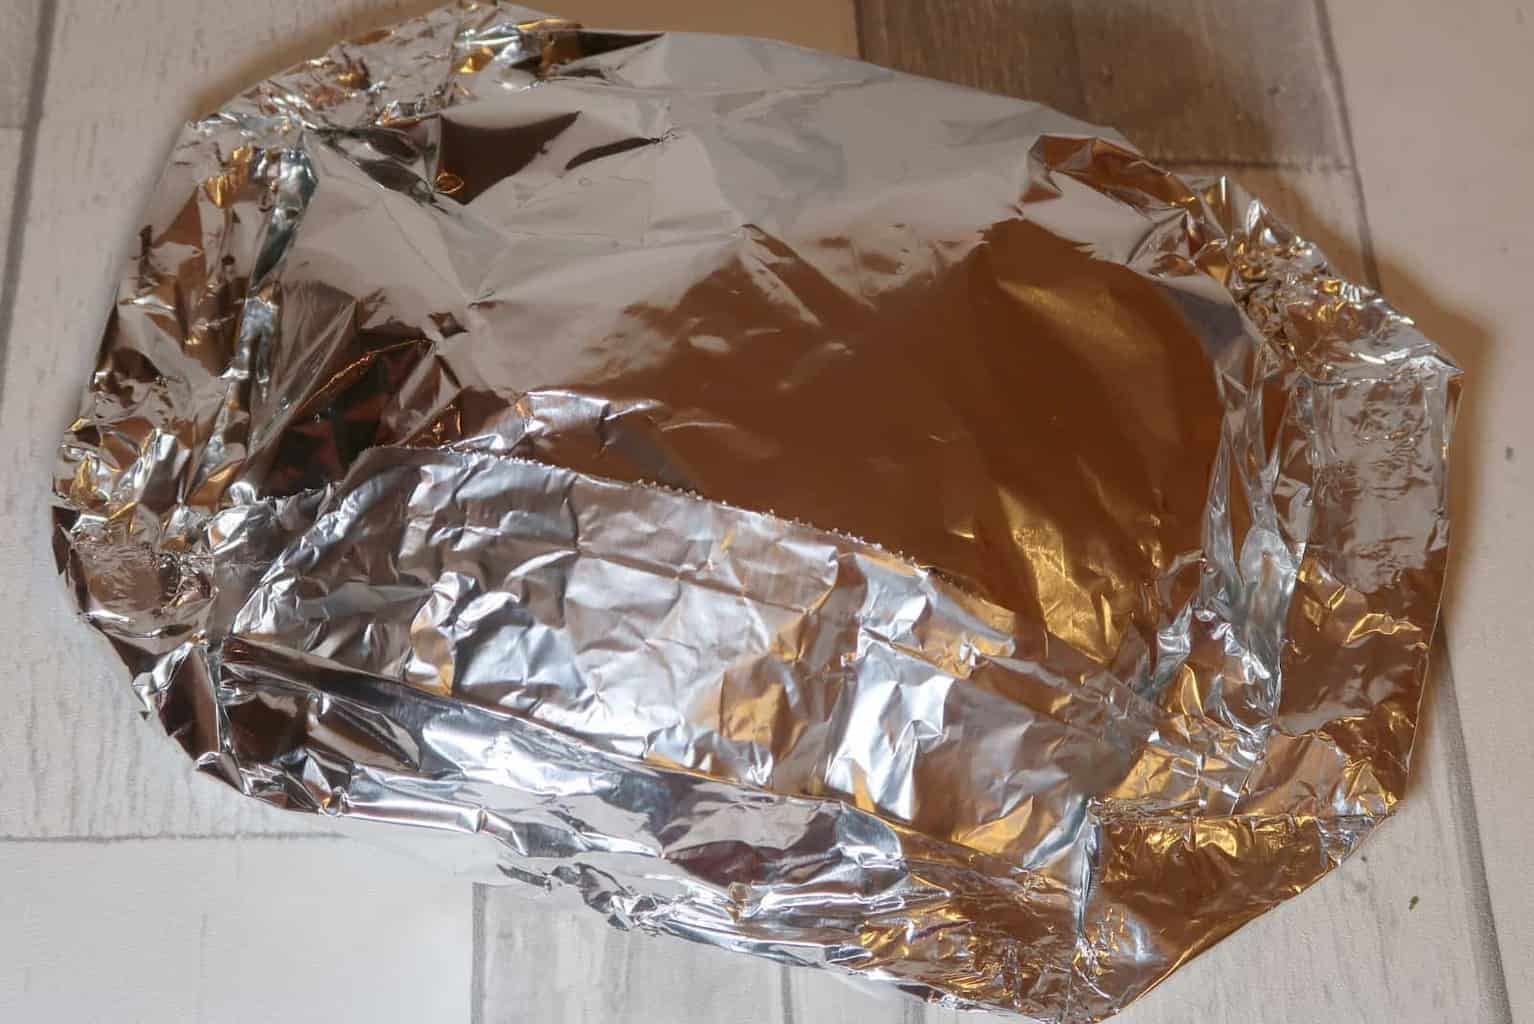 Bacofoil Non-Stick Kitchen Foil